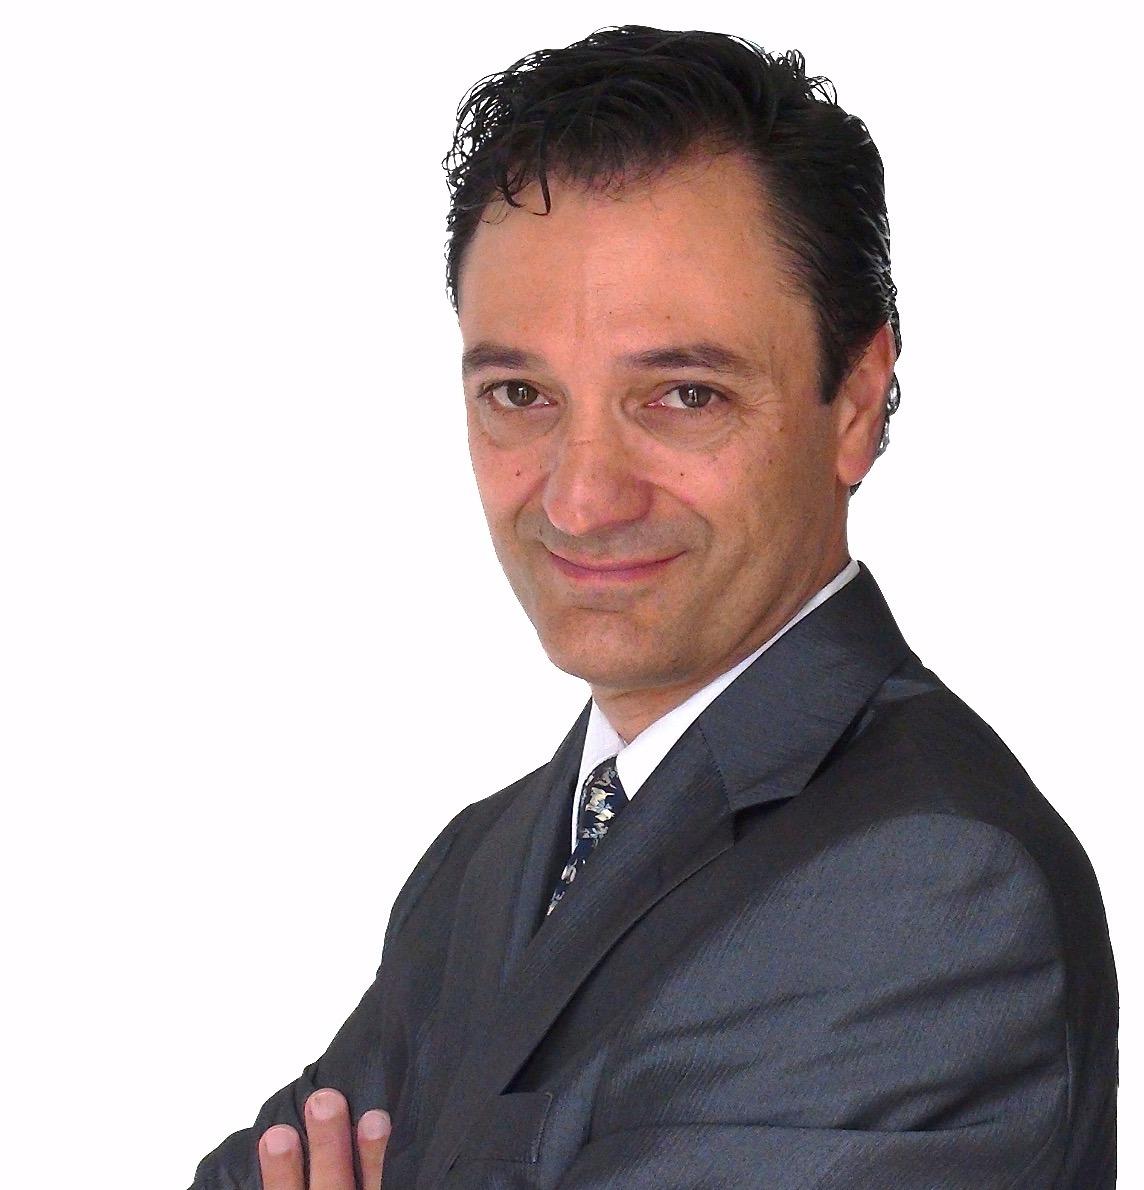 Luis Cuadro Moreno